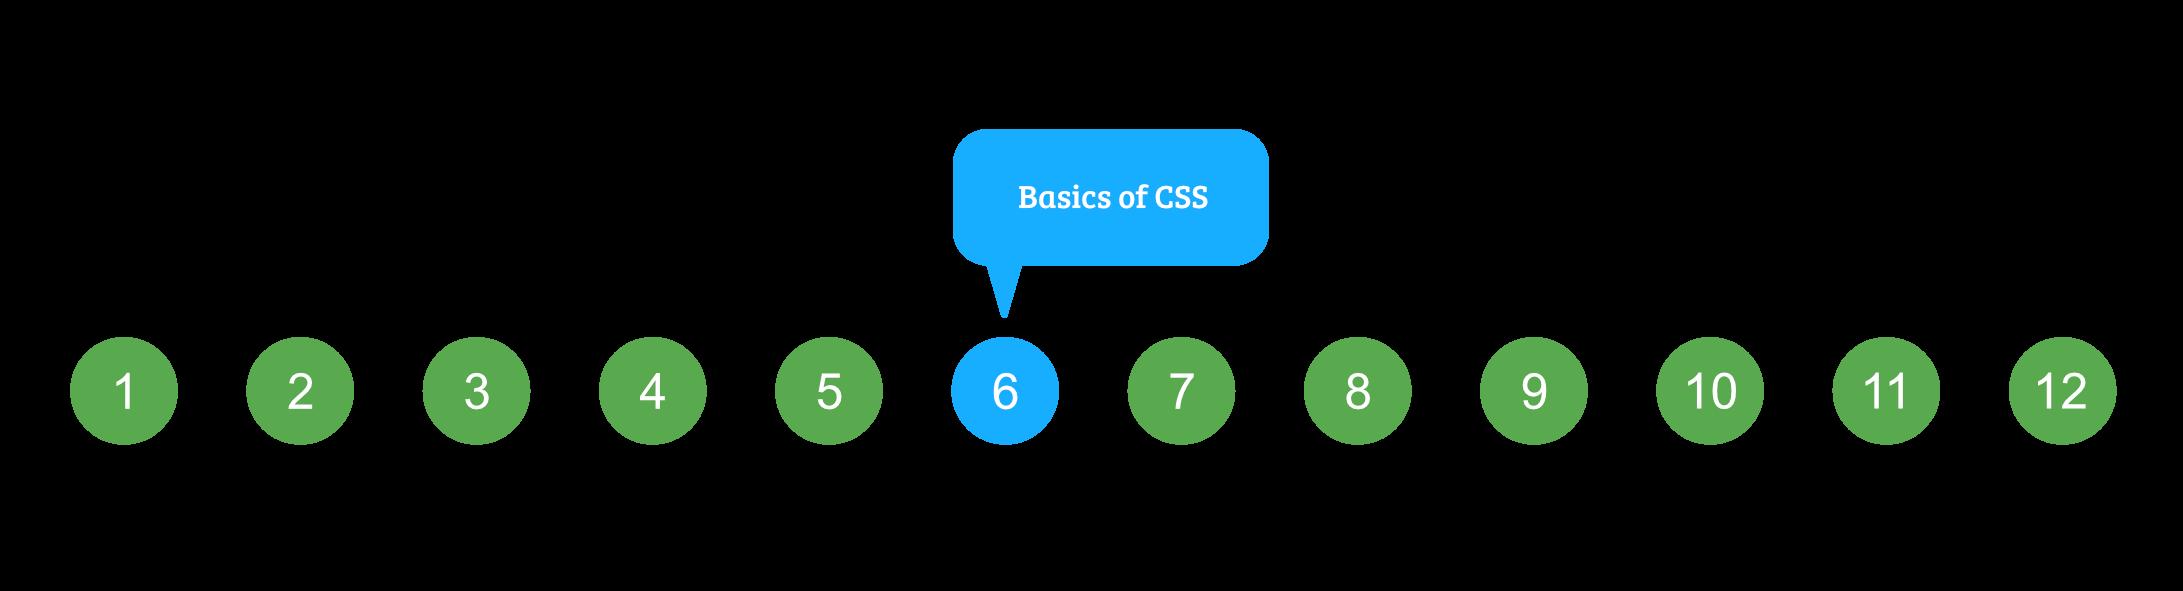 CSS Introduction - GeeksforGeeks